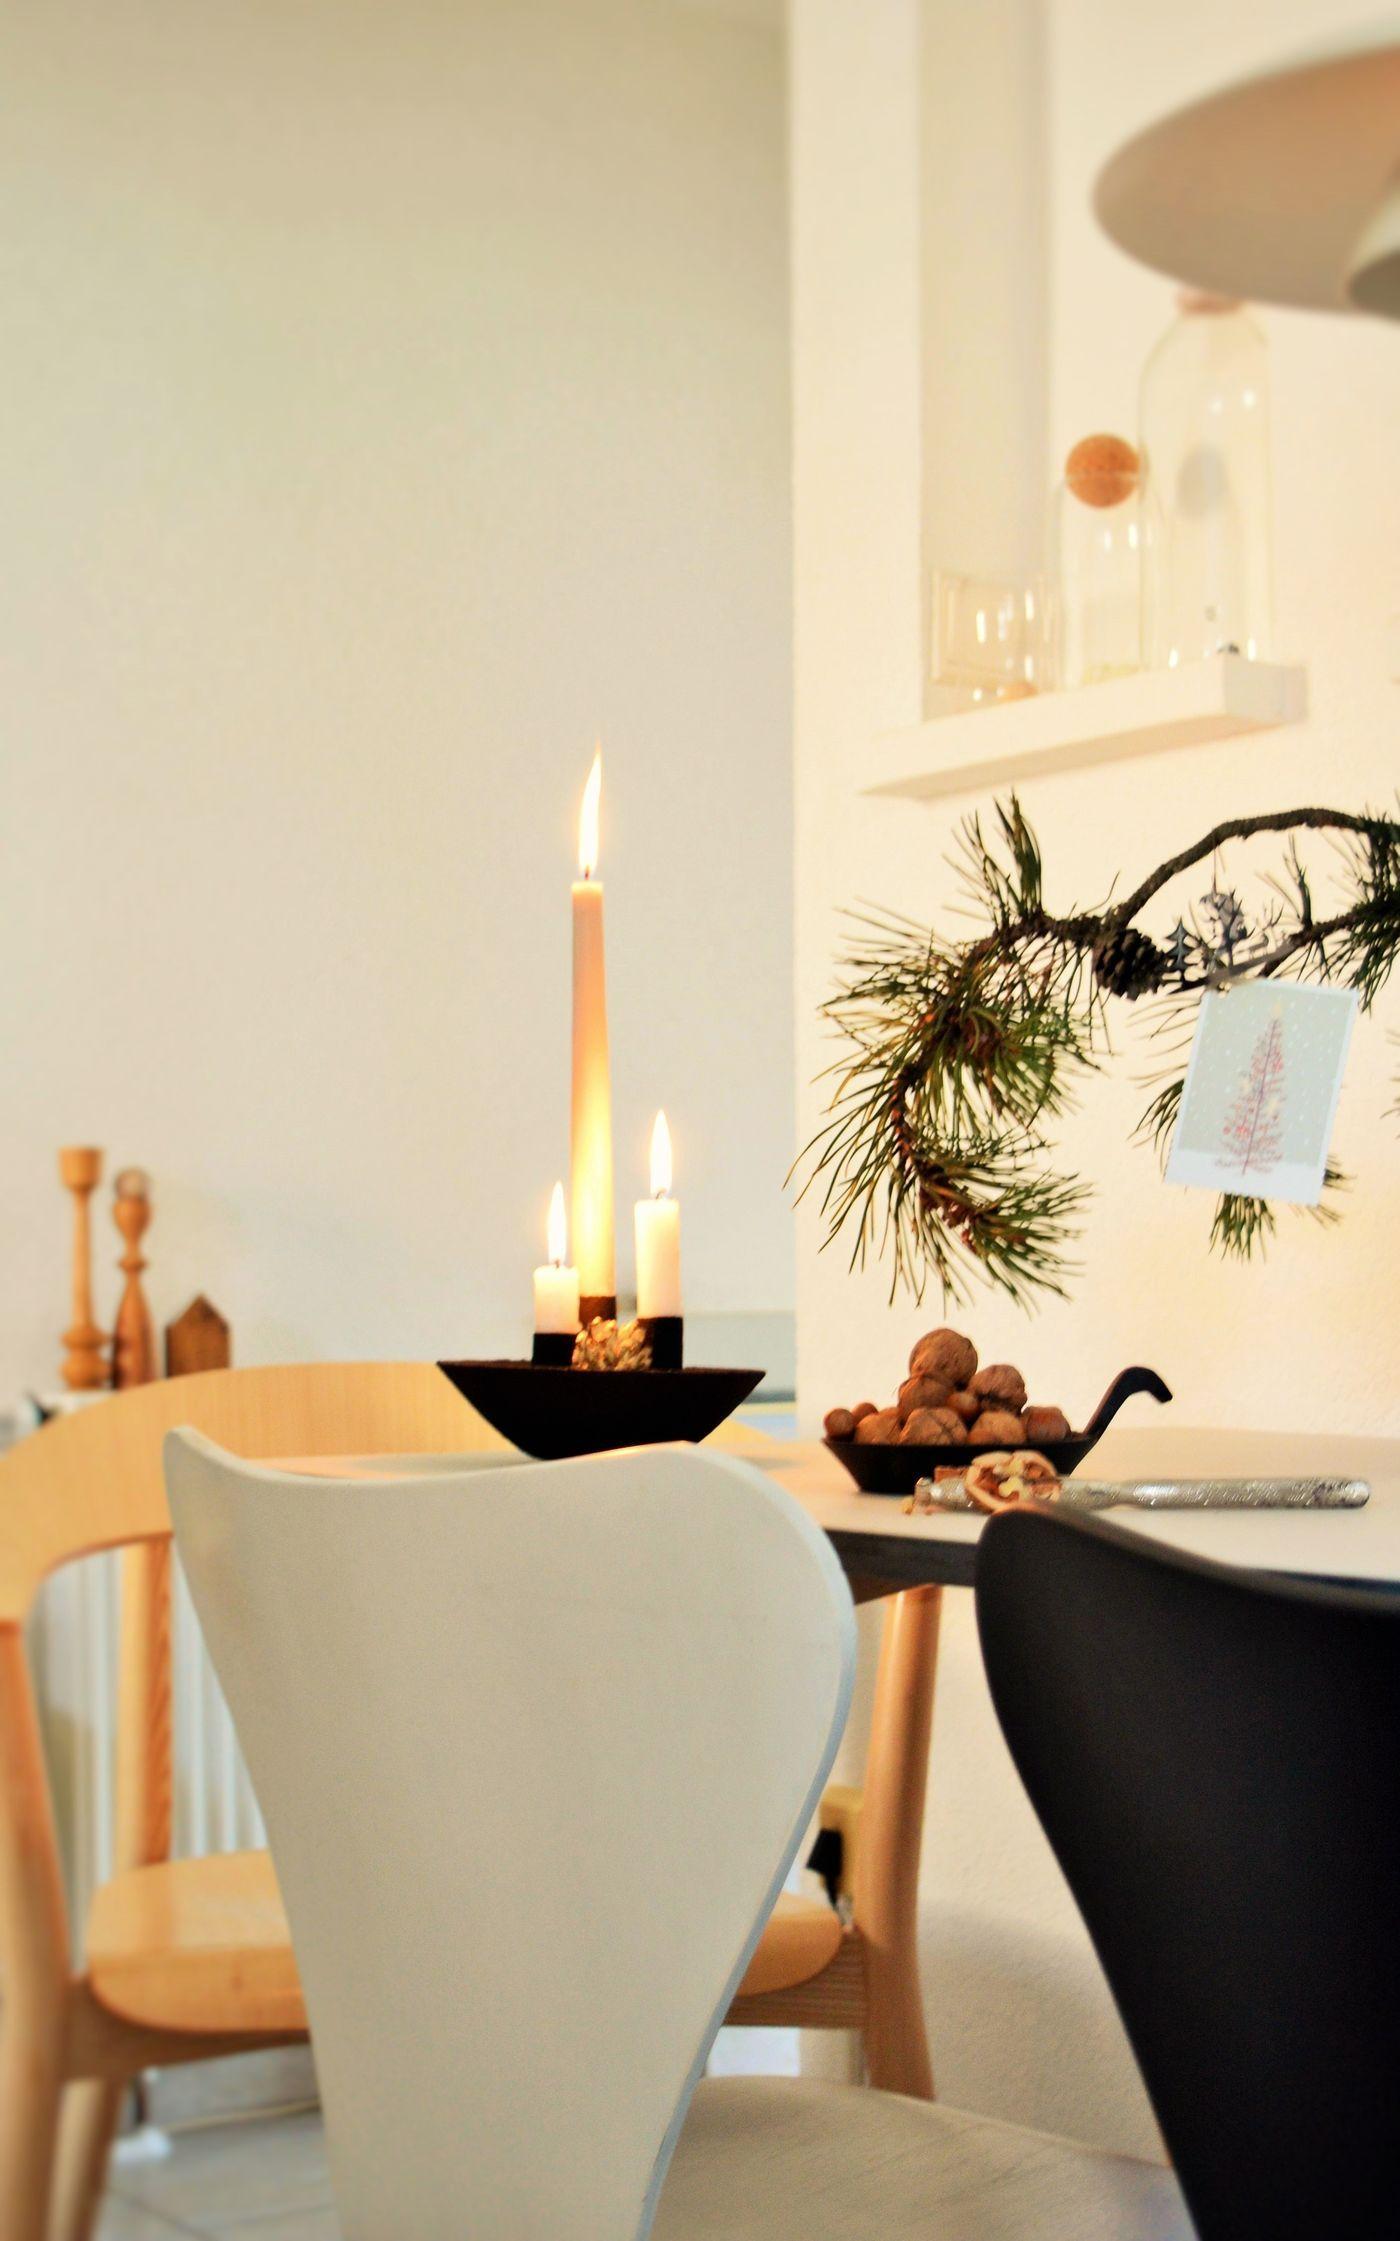 do it yourself ideen f r dein zuhause seite 3. Black Bedroom Furniture Sets. Home Design Ideas